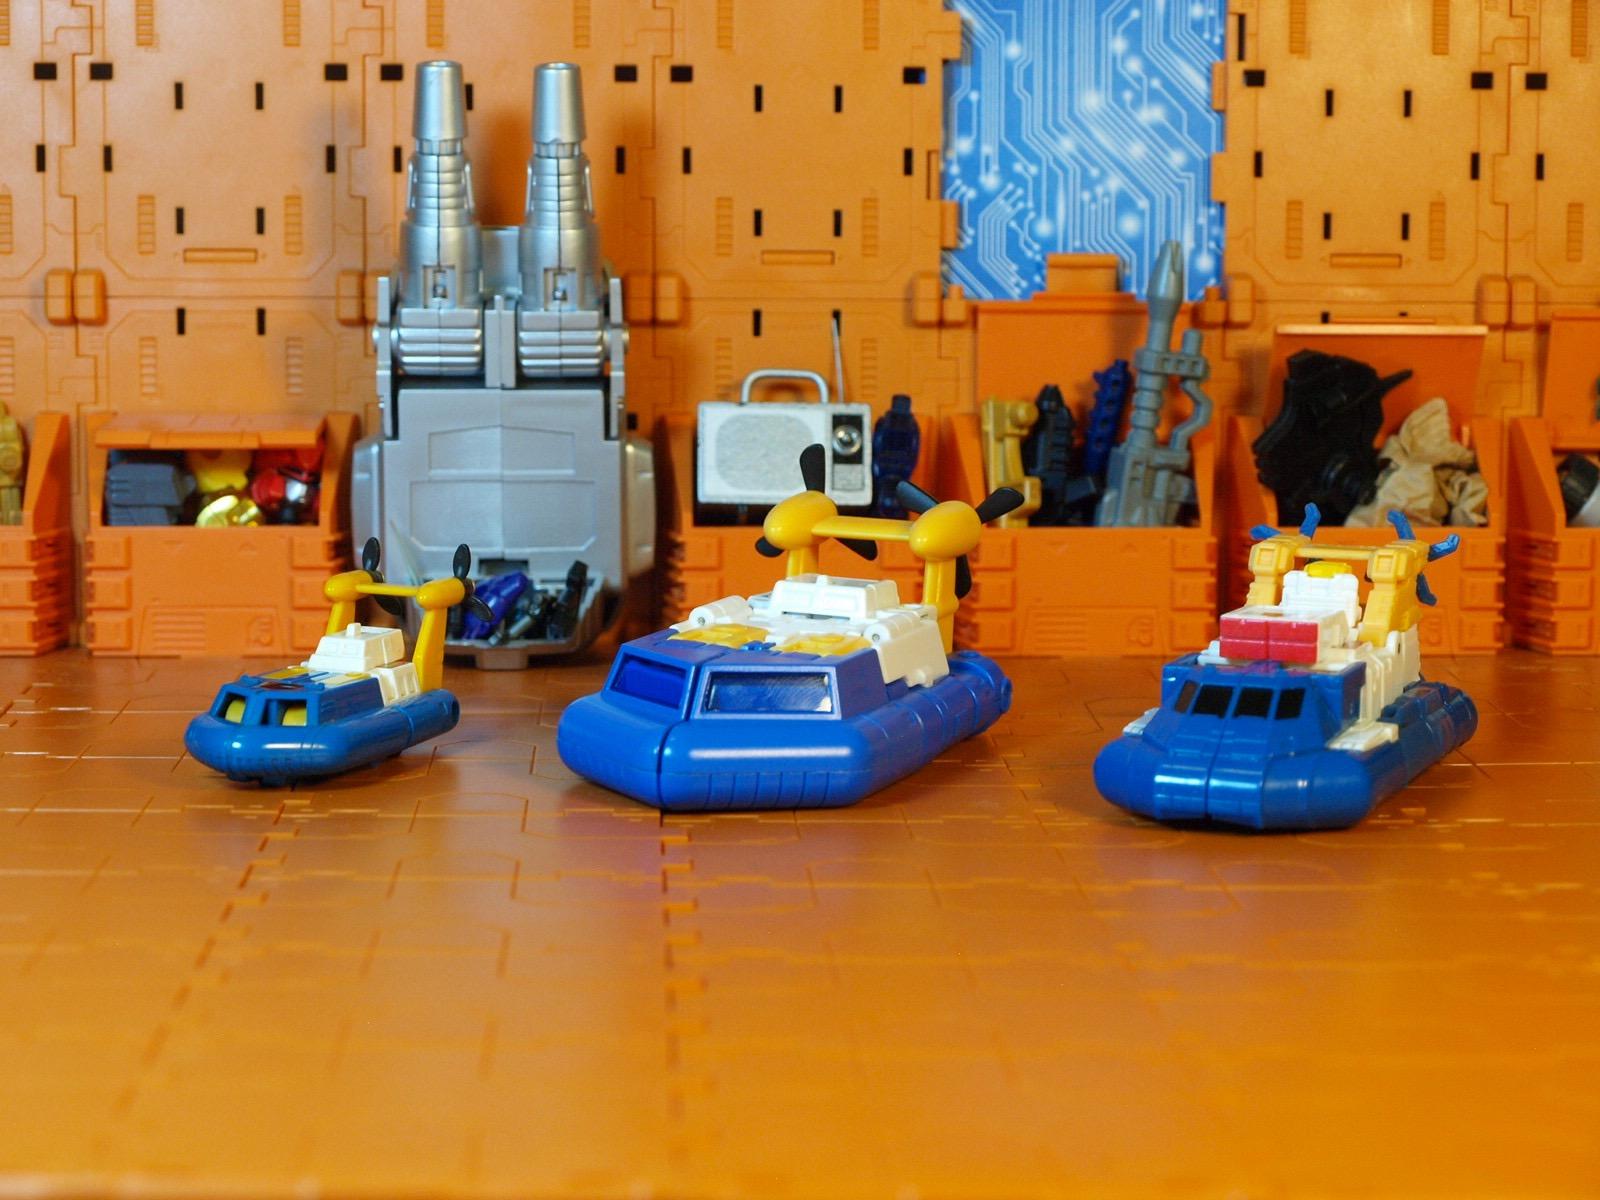 Spindrift Hovercraft comparison